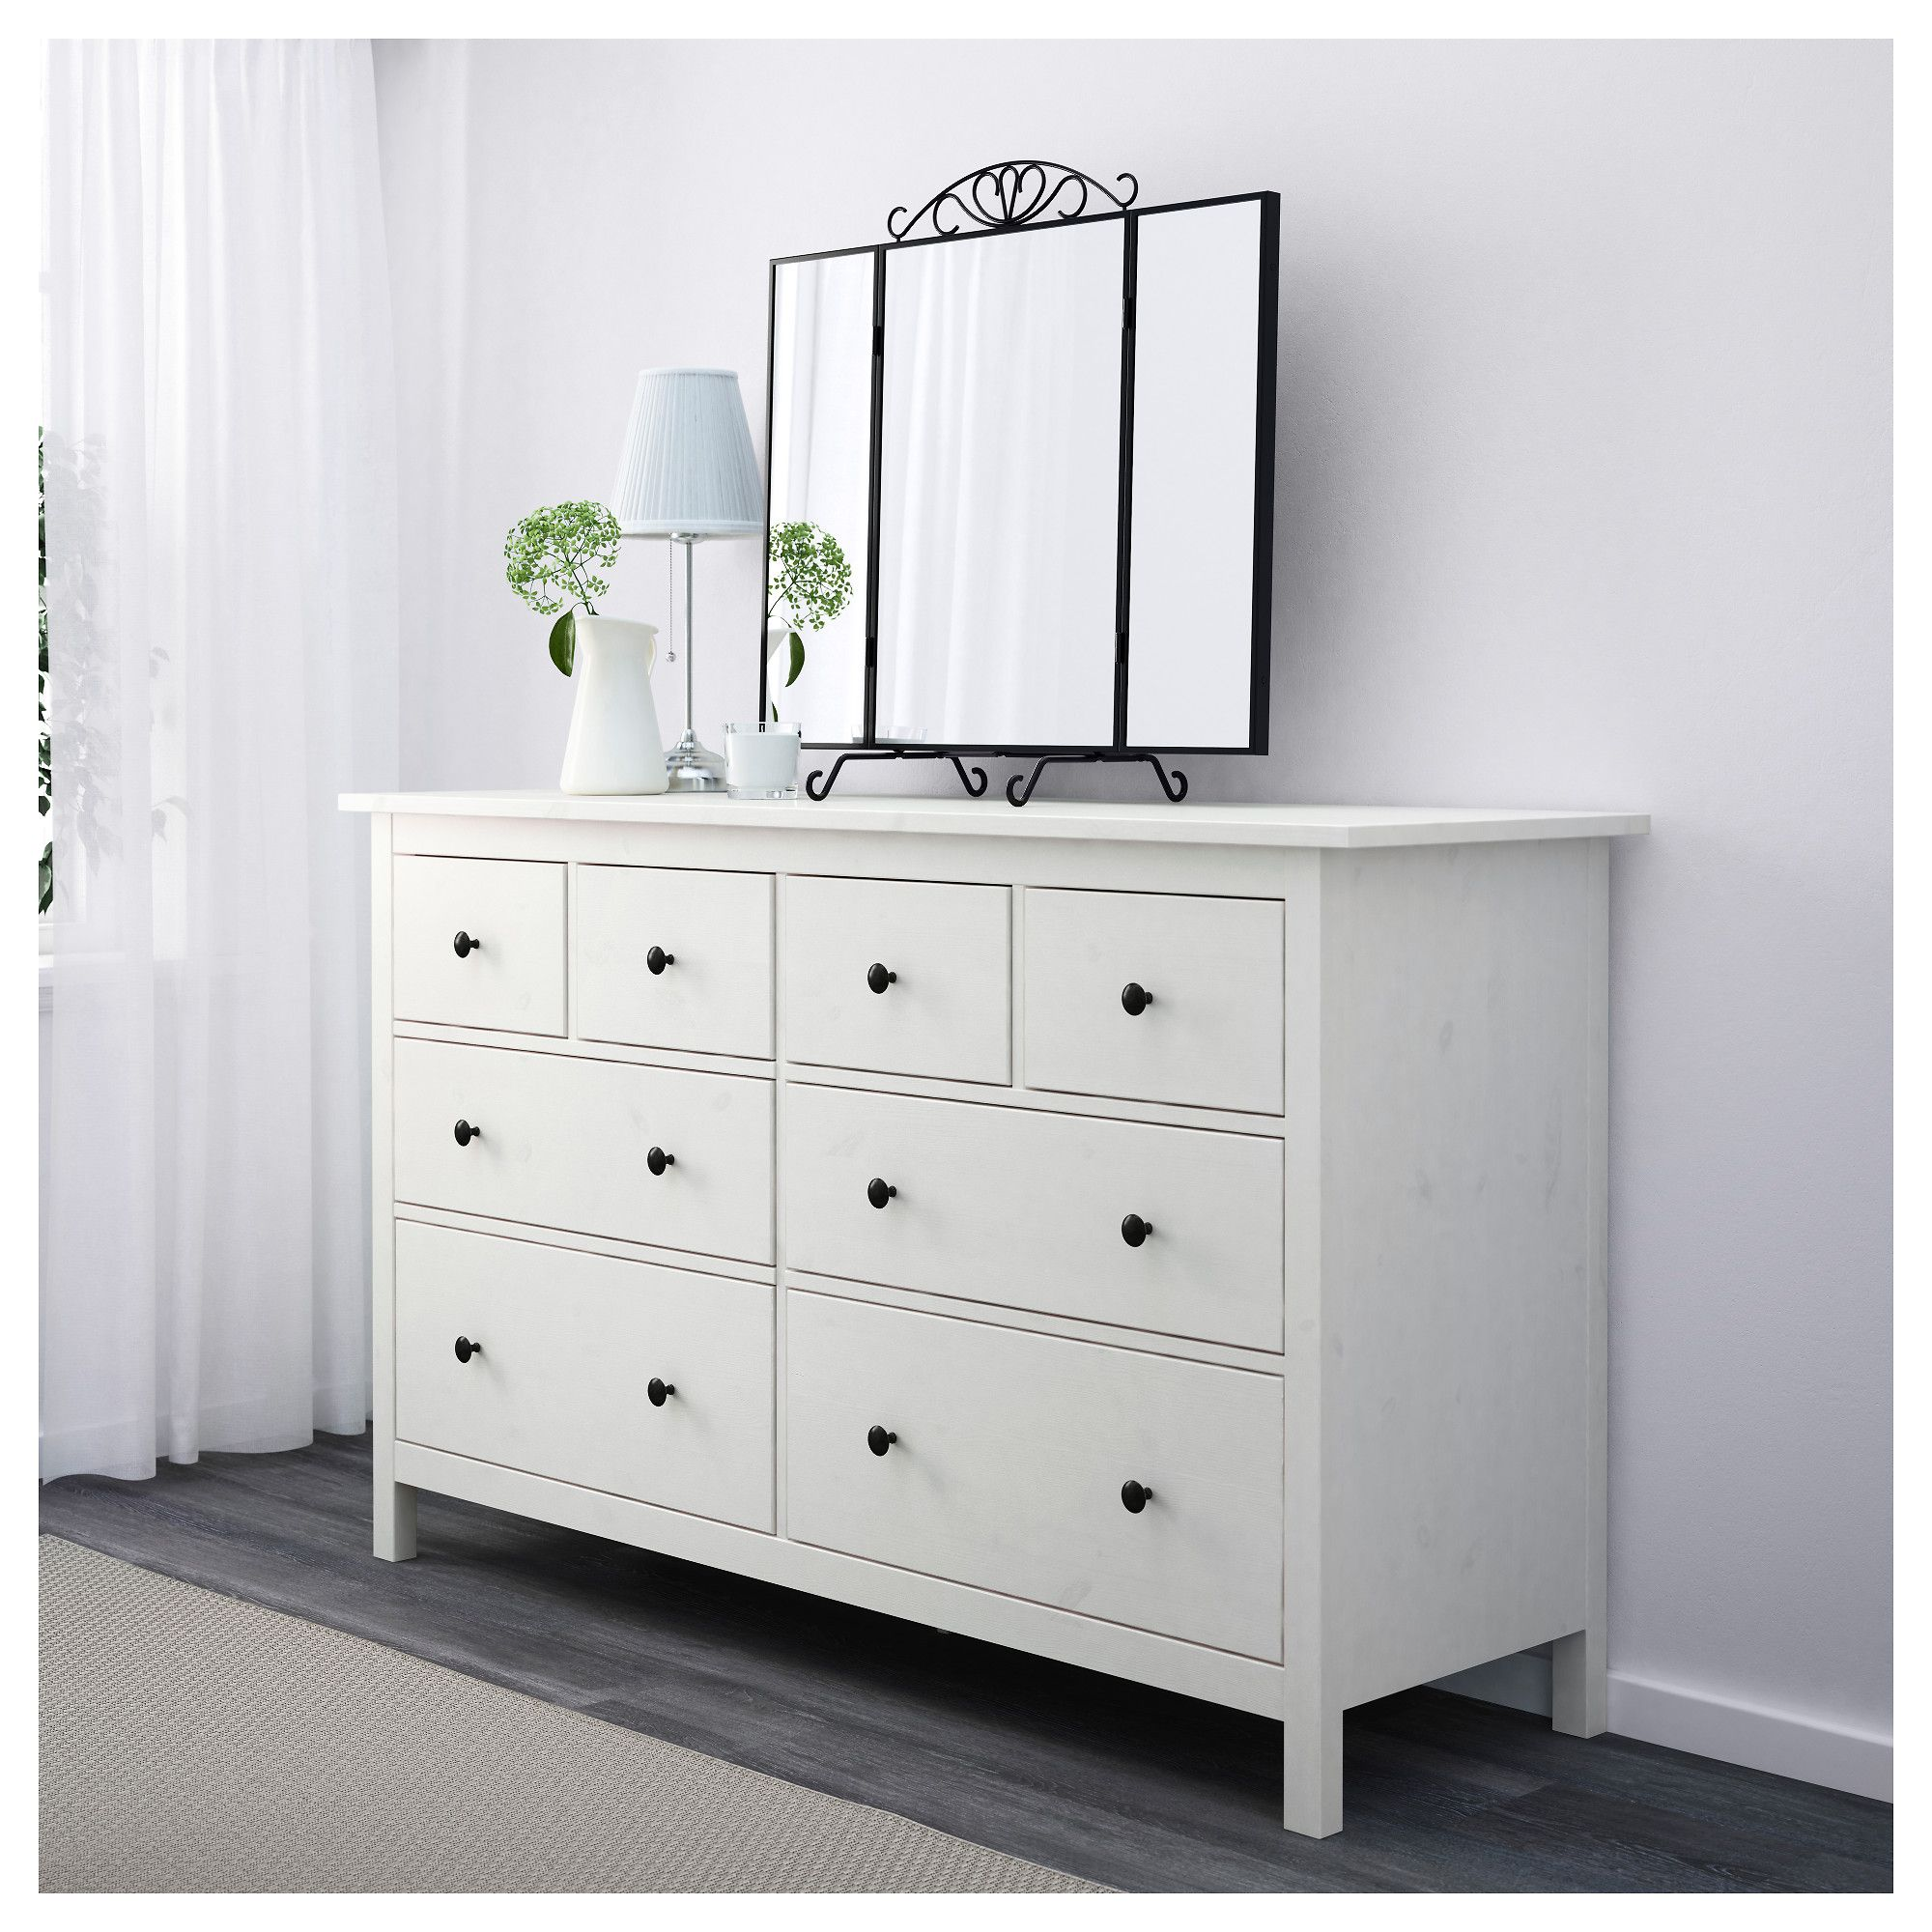 13 Best IKEA images | Ikea, Hemnes, White stain